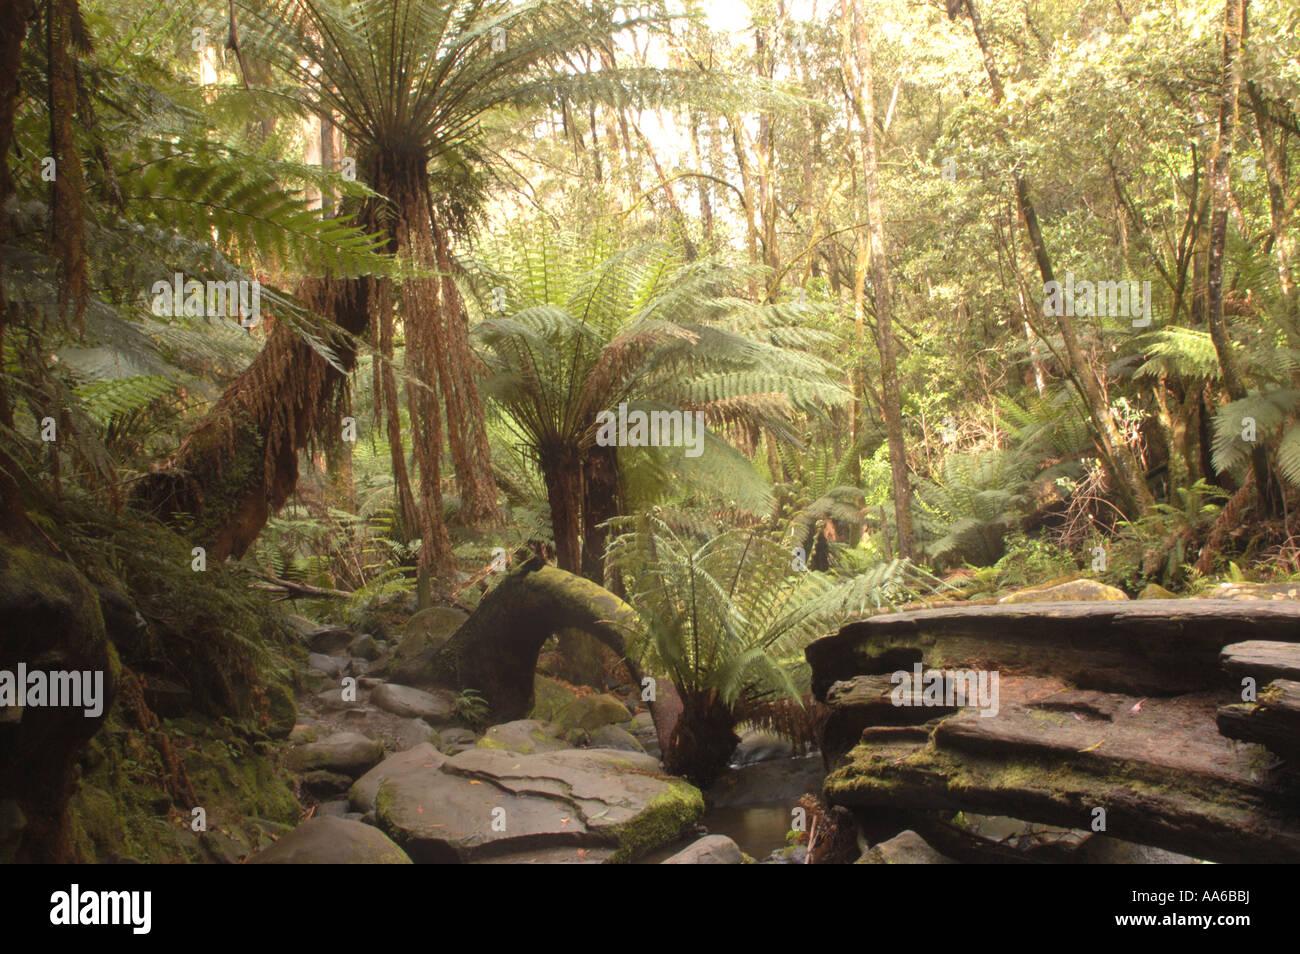 Temperate rainforest, Otways National park - Stock Image